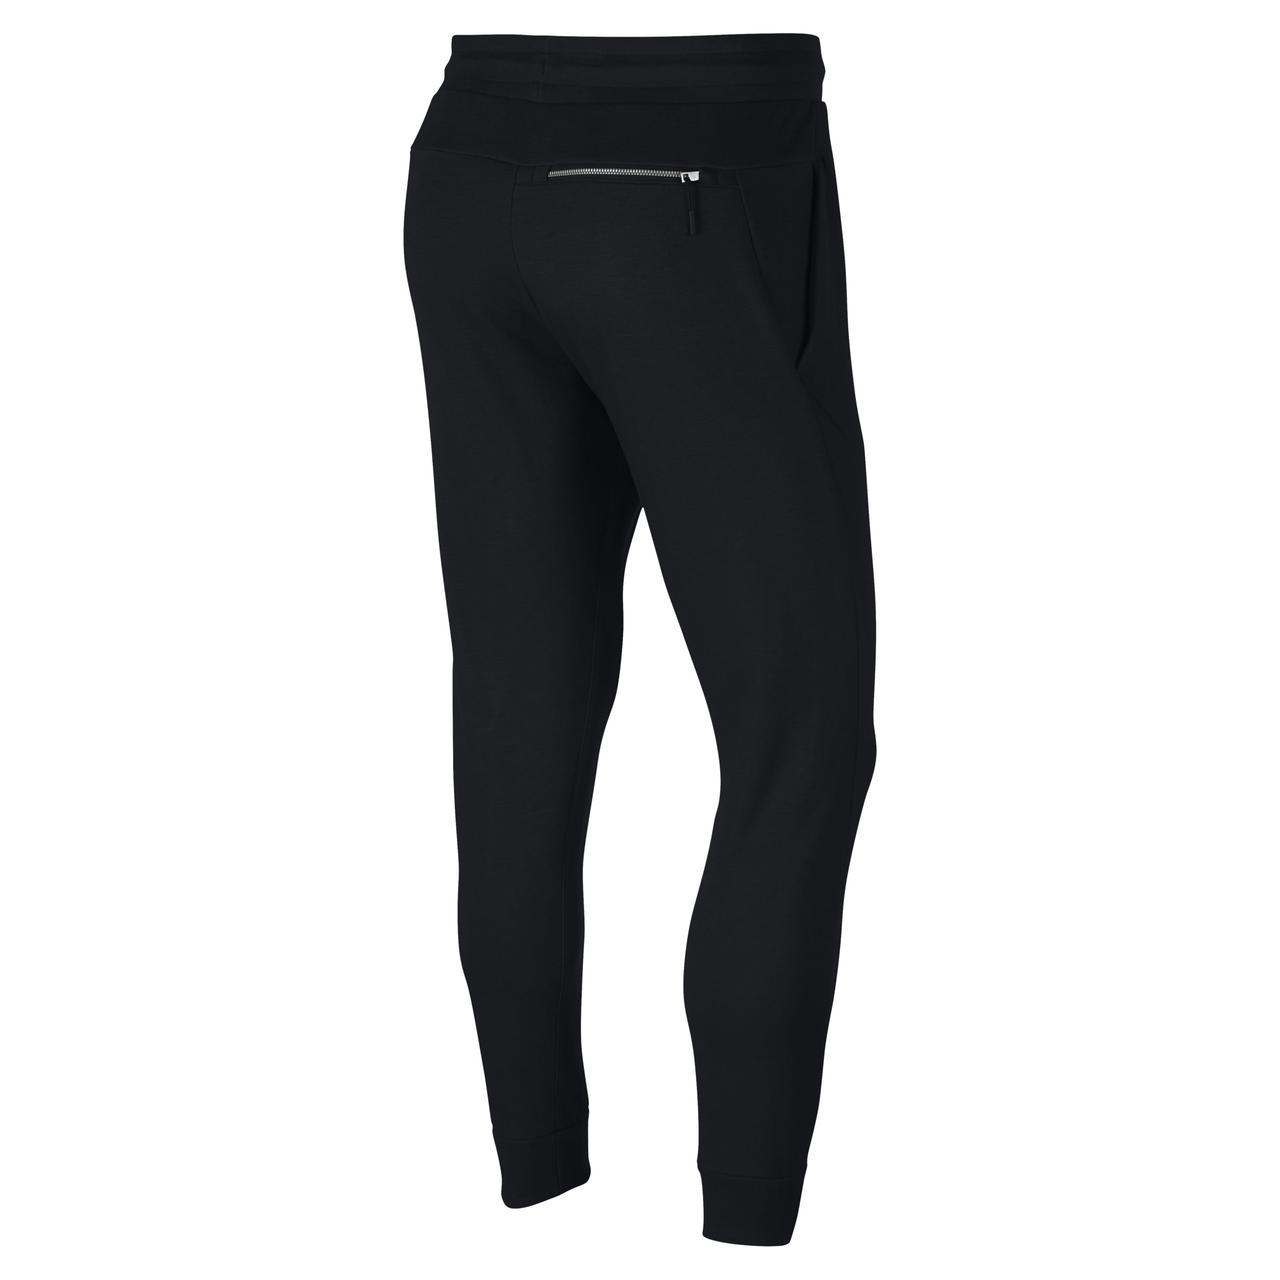 02c88672 Штаны Nike Nsw Optilc Jggr 928493-011 (Оригинал), цена 1 529,10 грн.,  купить в Киеве — Prom.ua (ID#746505661)